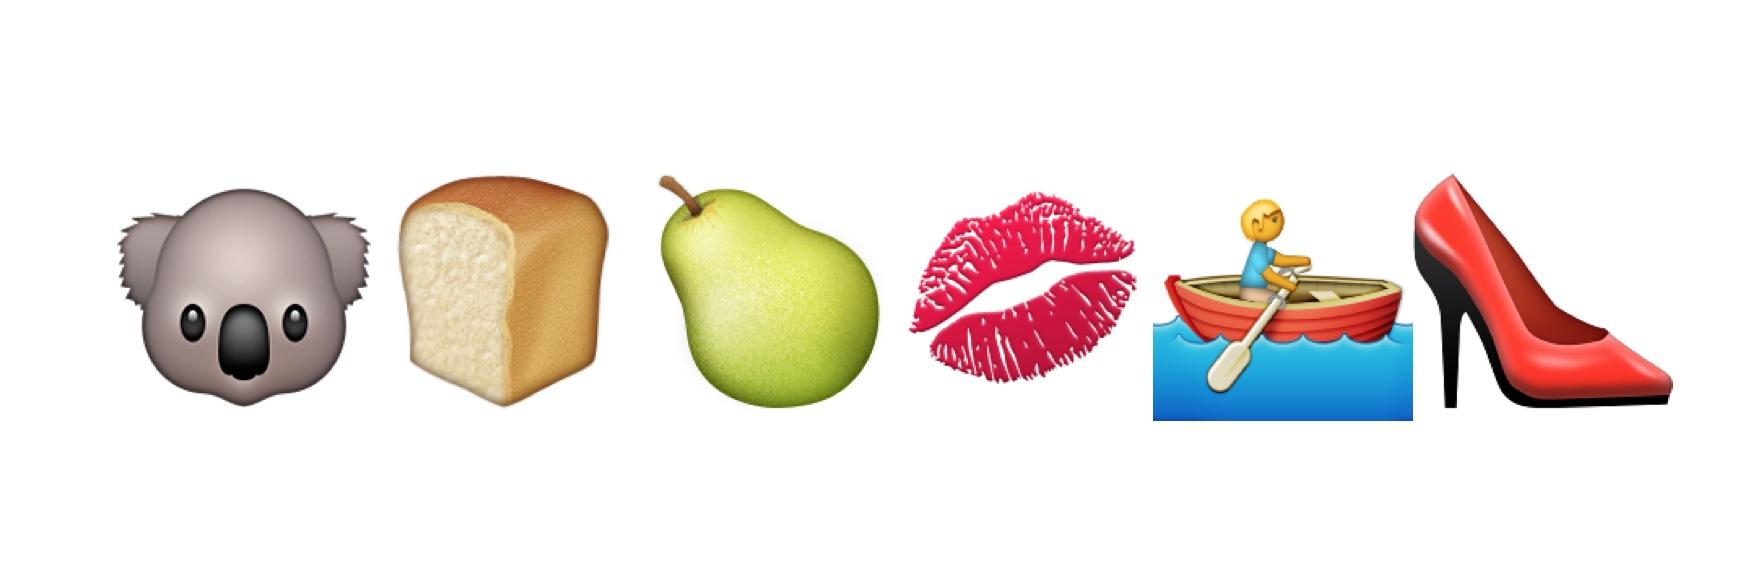 snapchat-verified-emojis